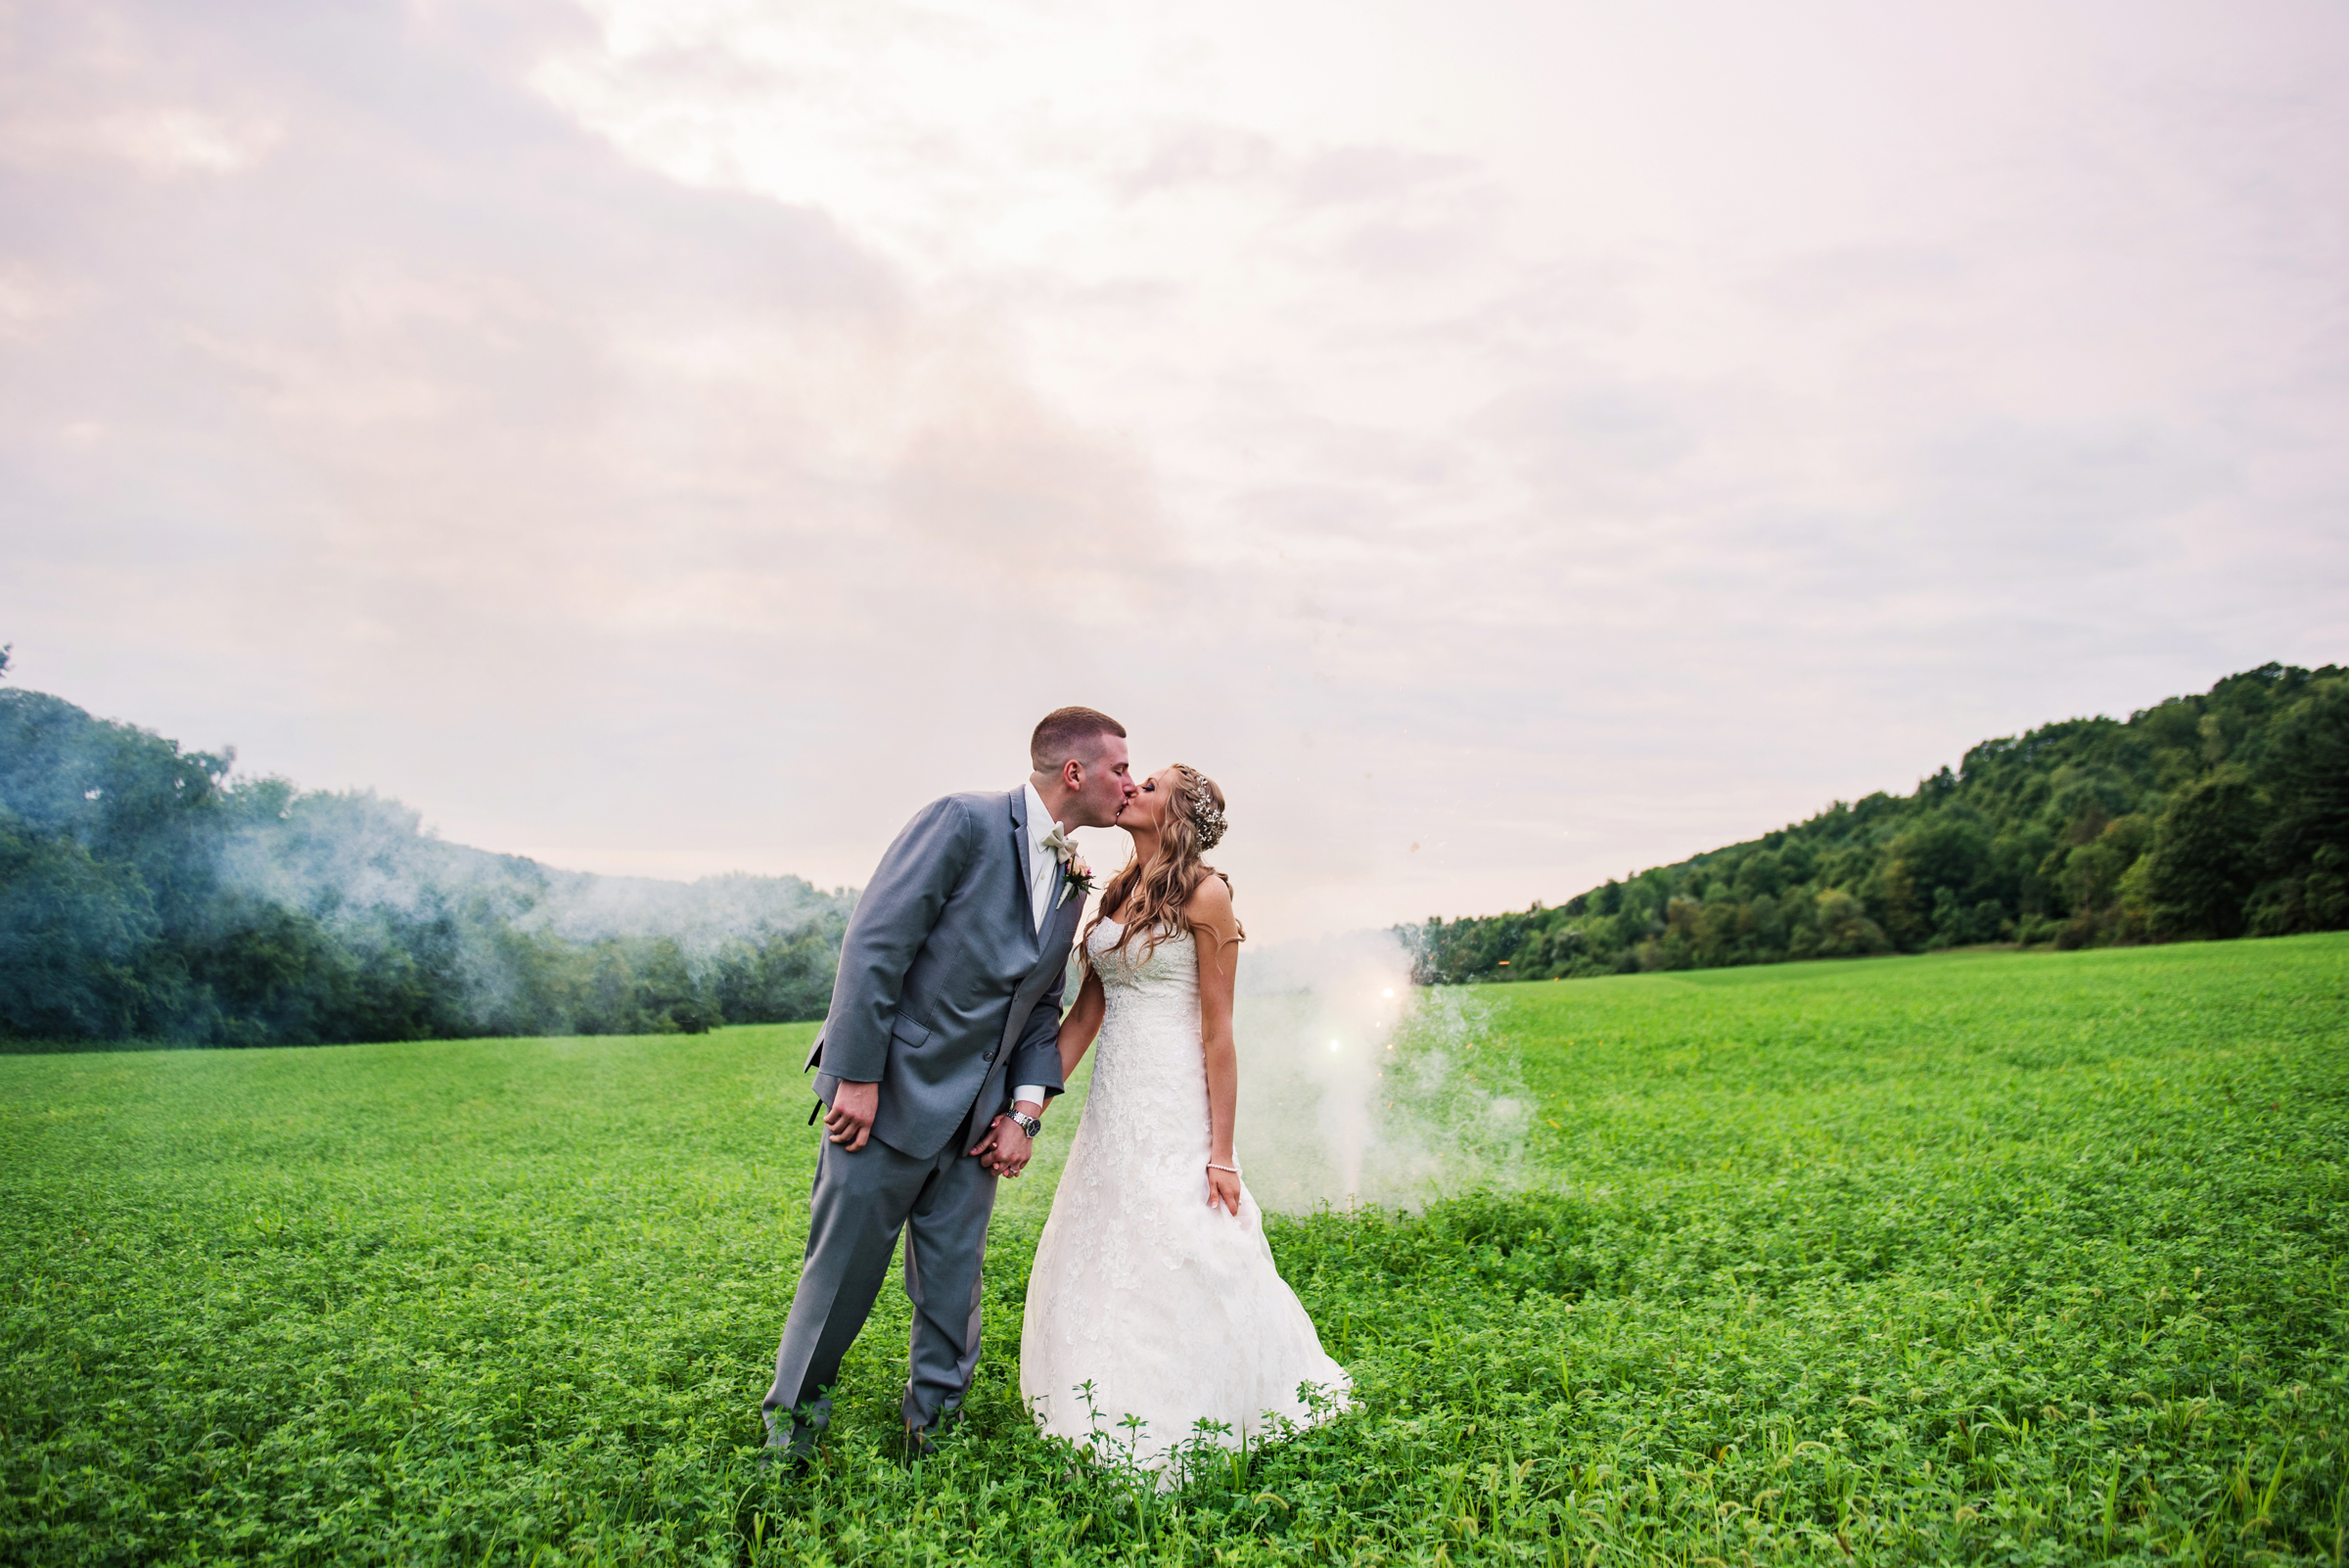 Wolf_Oak_Acres_Central_NY_Wedding_JILL_STUDIO_Rochester_NY_Photographer_DSC_8970.jpg